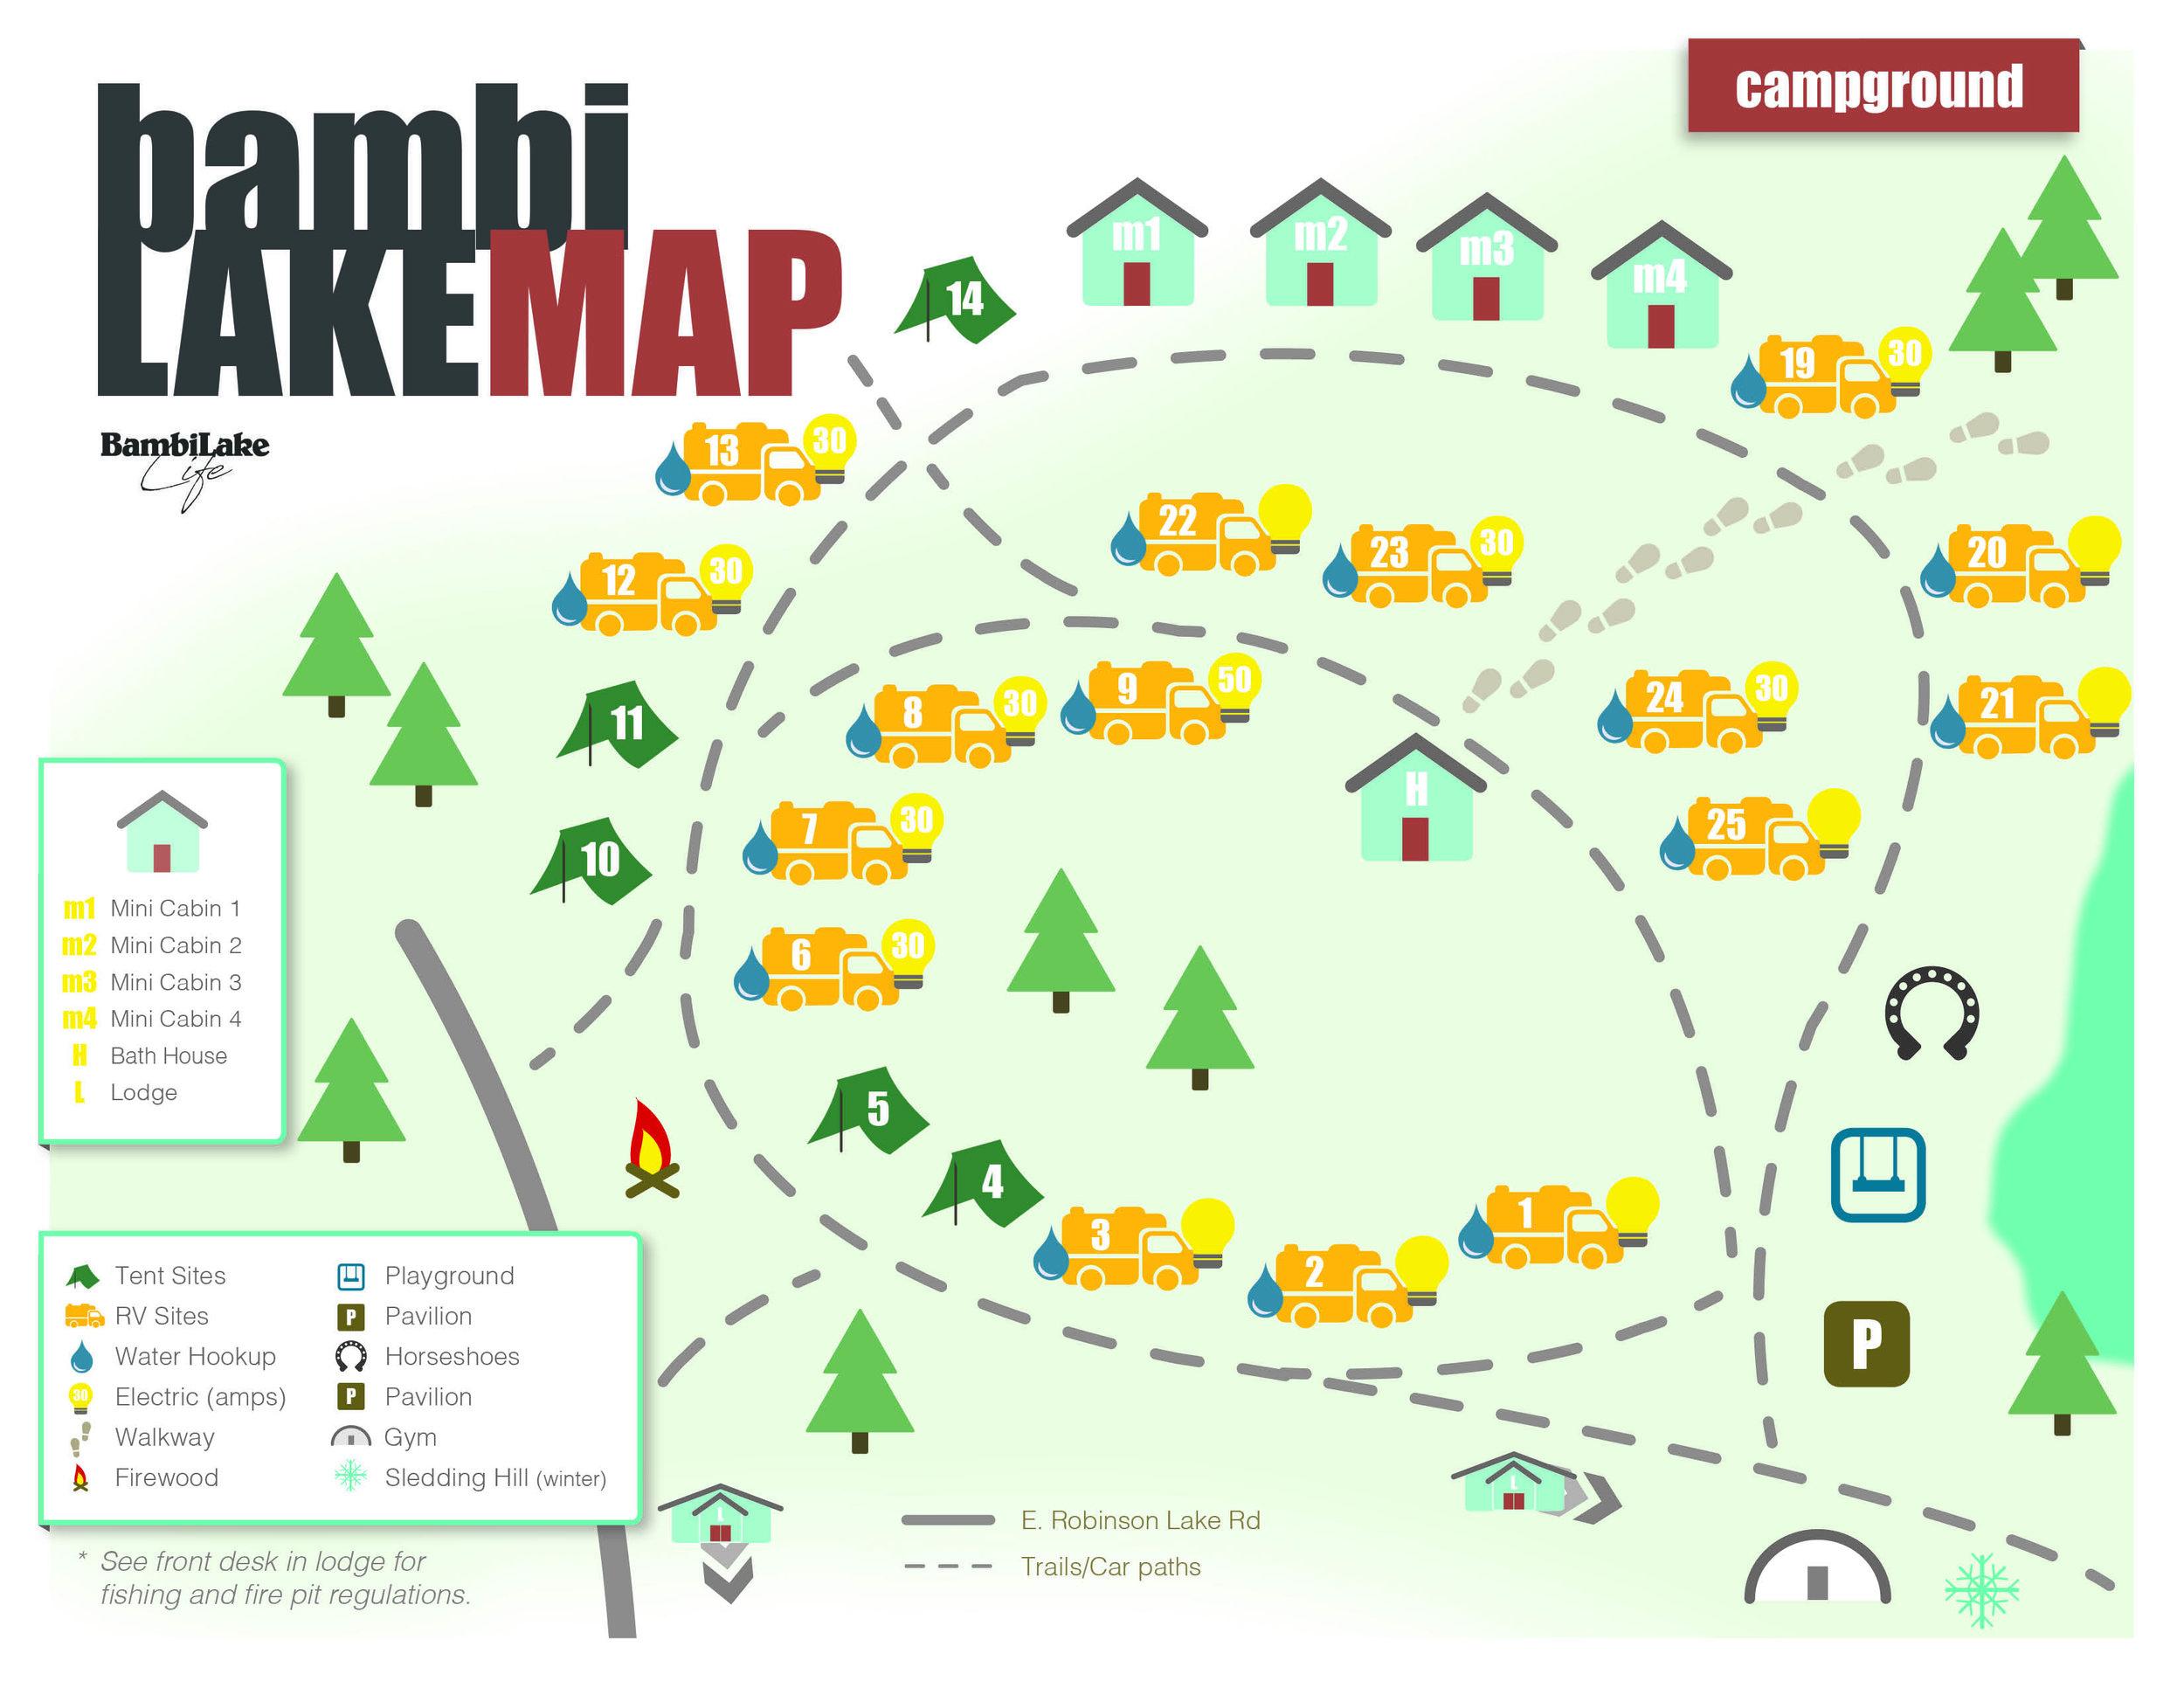 BambiLakeCampMAPS_Campground.jpg